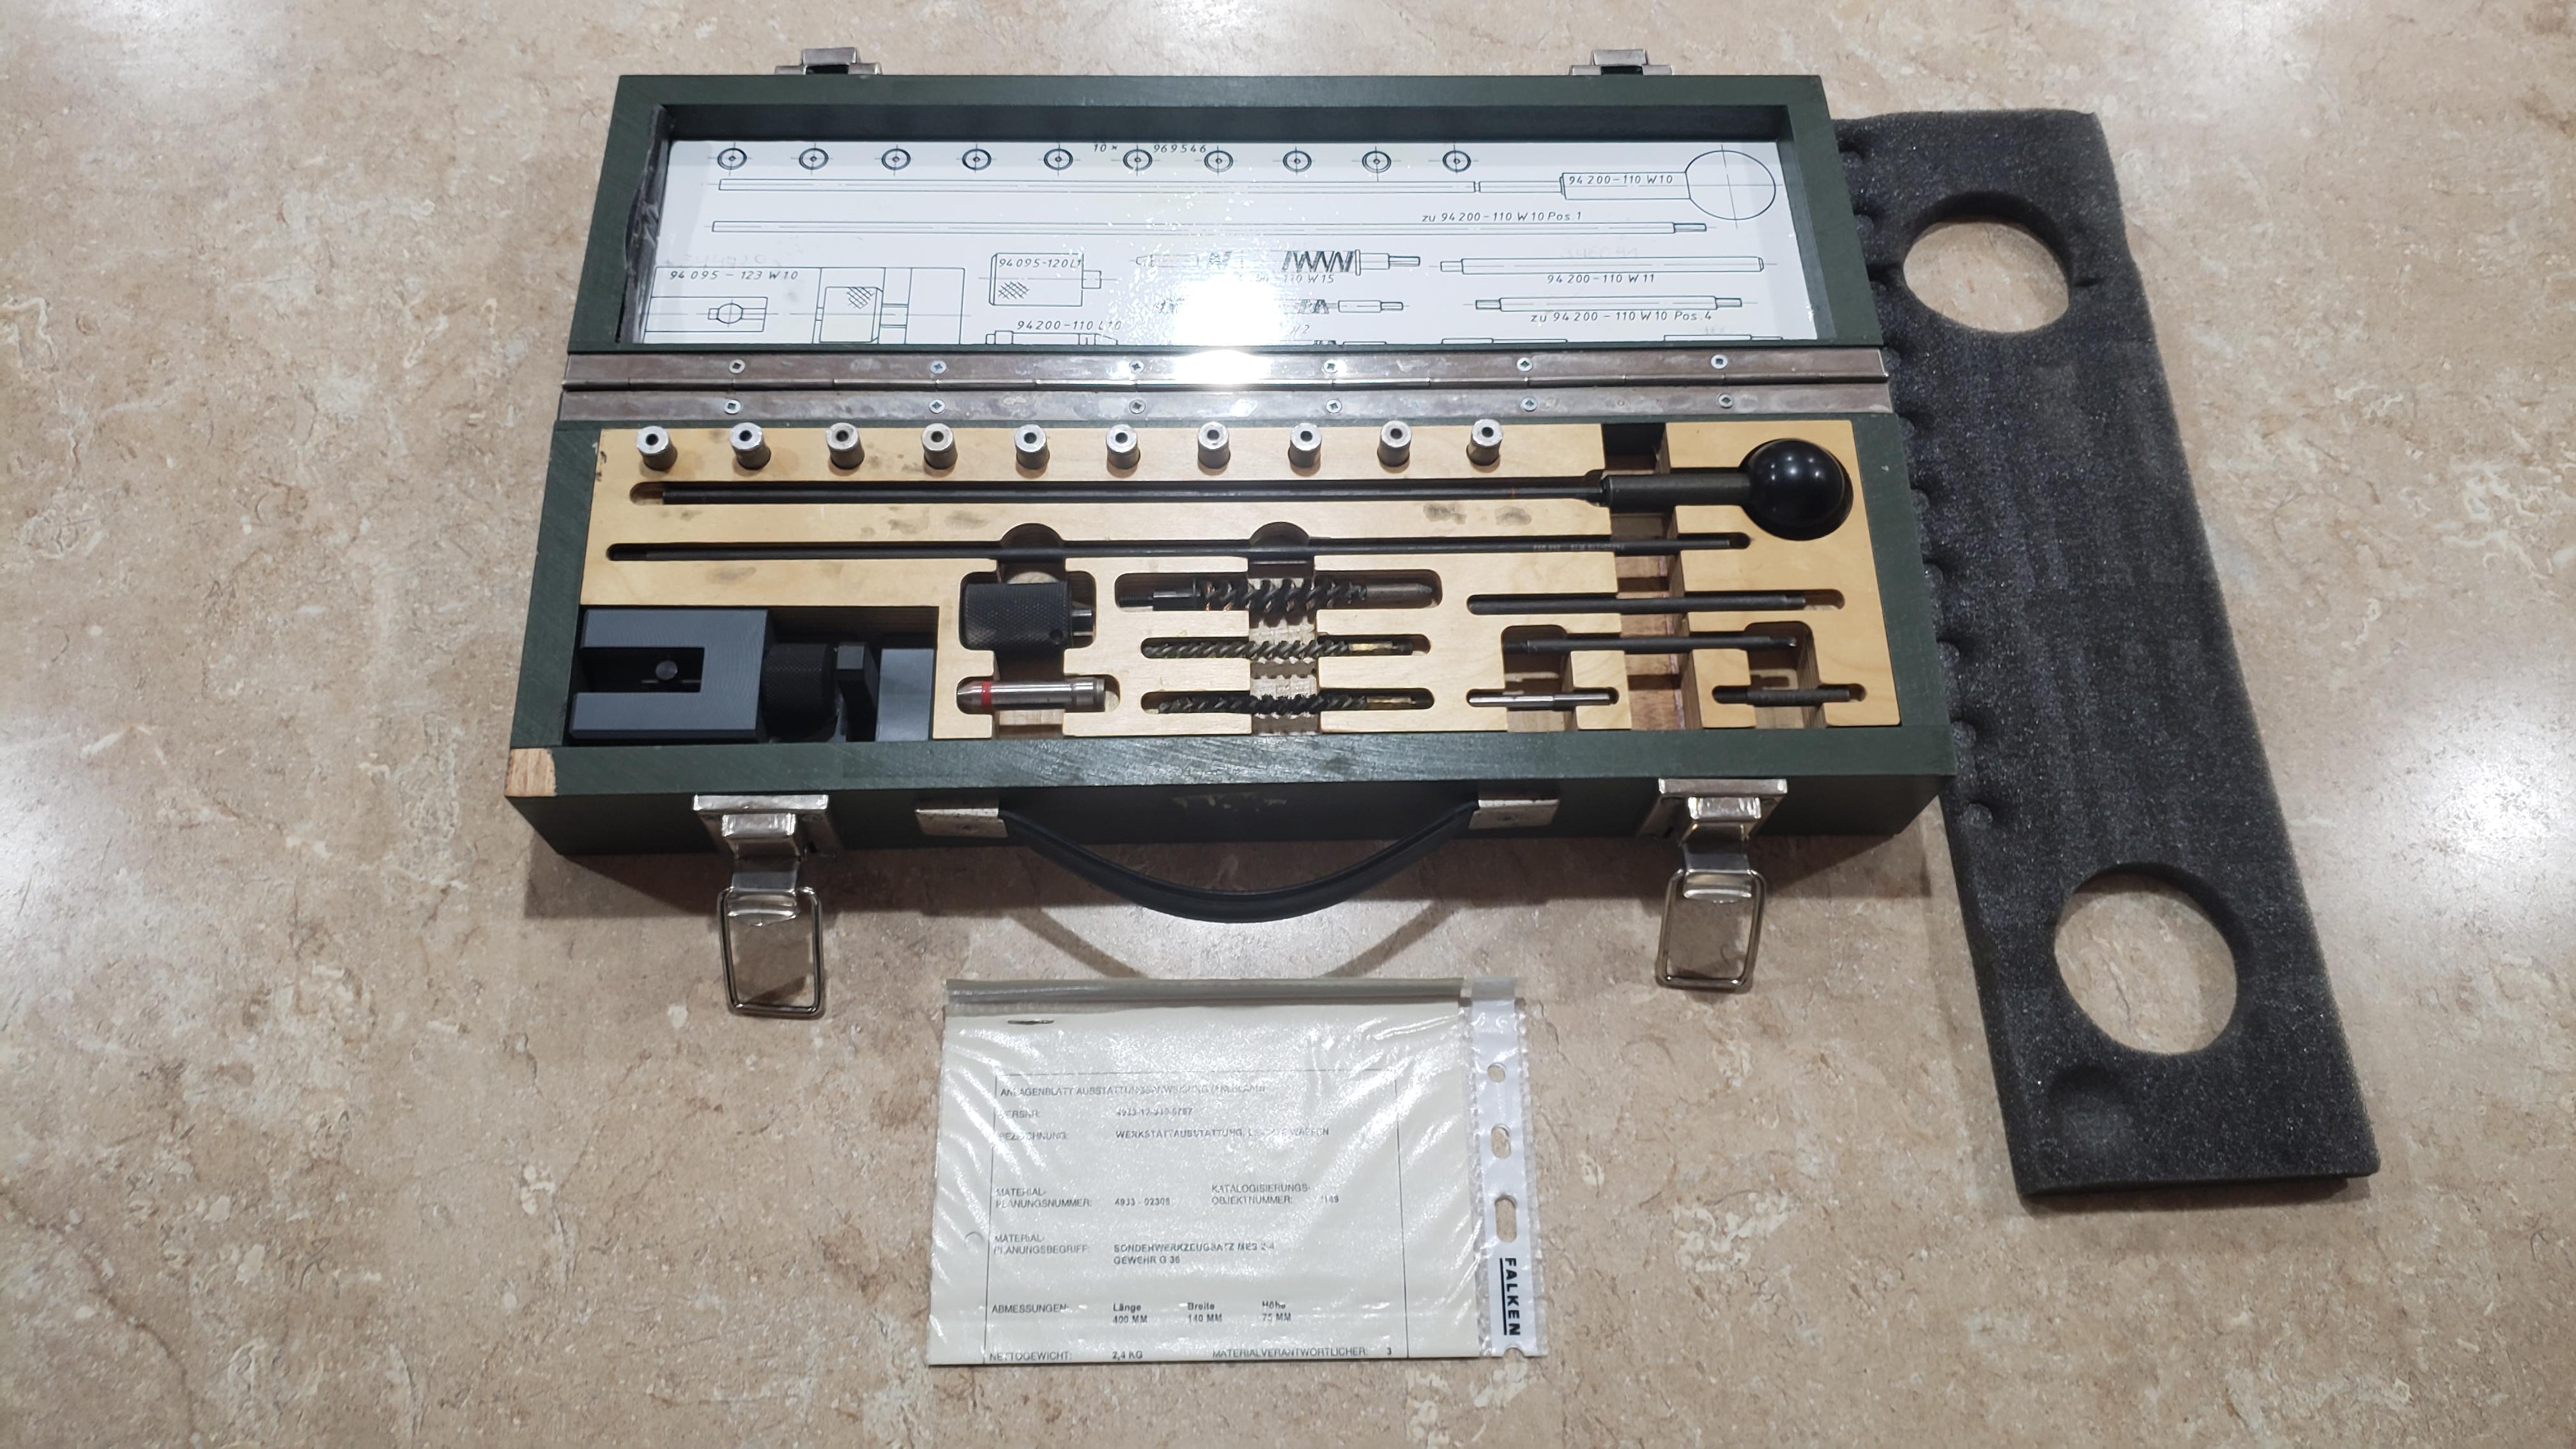 WTS: C93 Furniture, LDI MP5 Vis laser, A3 Pistol Brace, G36 Armorer's Kit *New Items*-g36-3.jpg